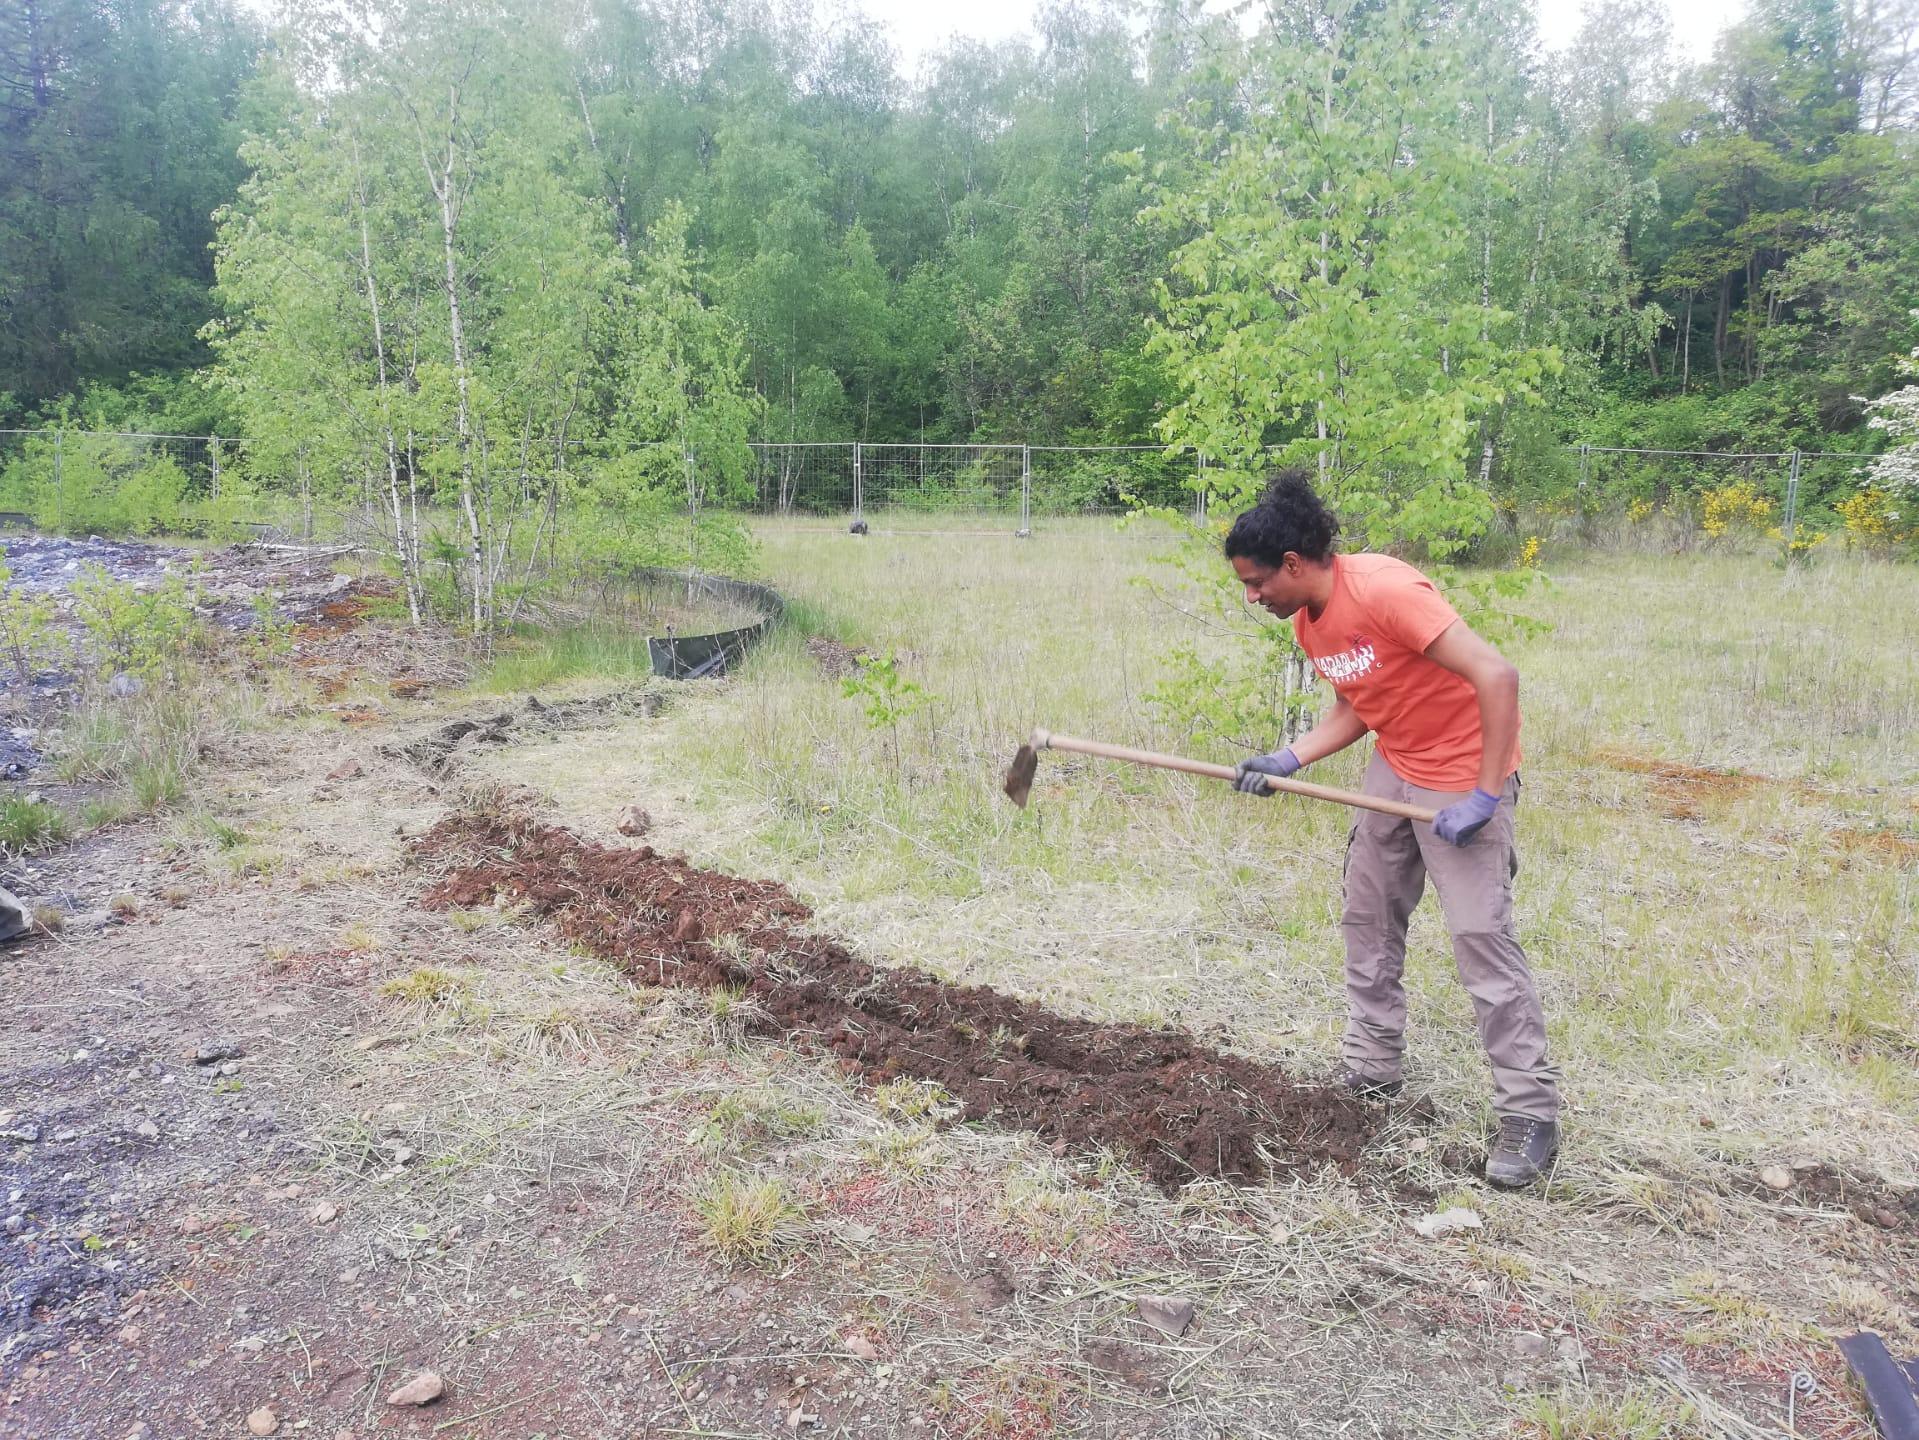 Travailler-dans-Environnement_Biotope-Environnement